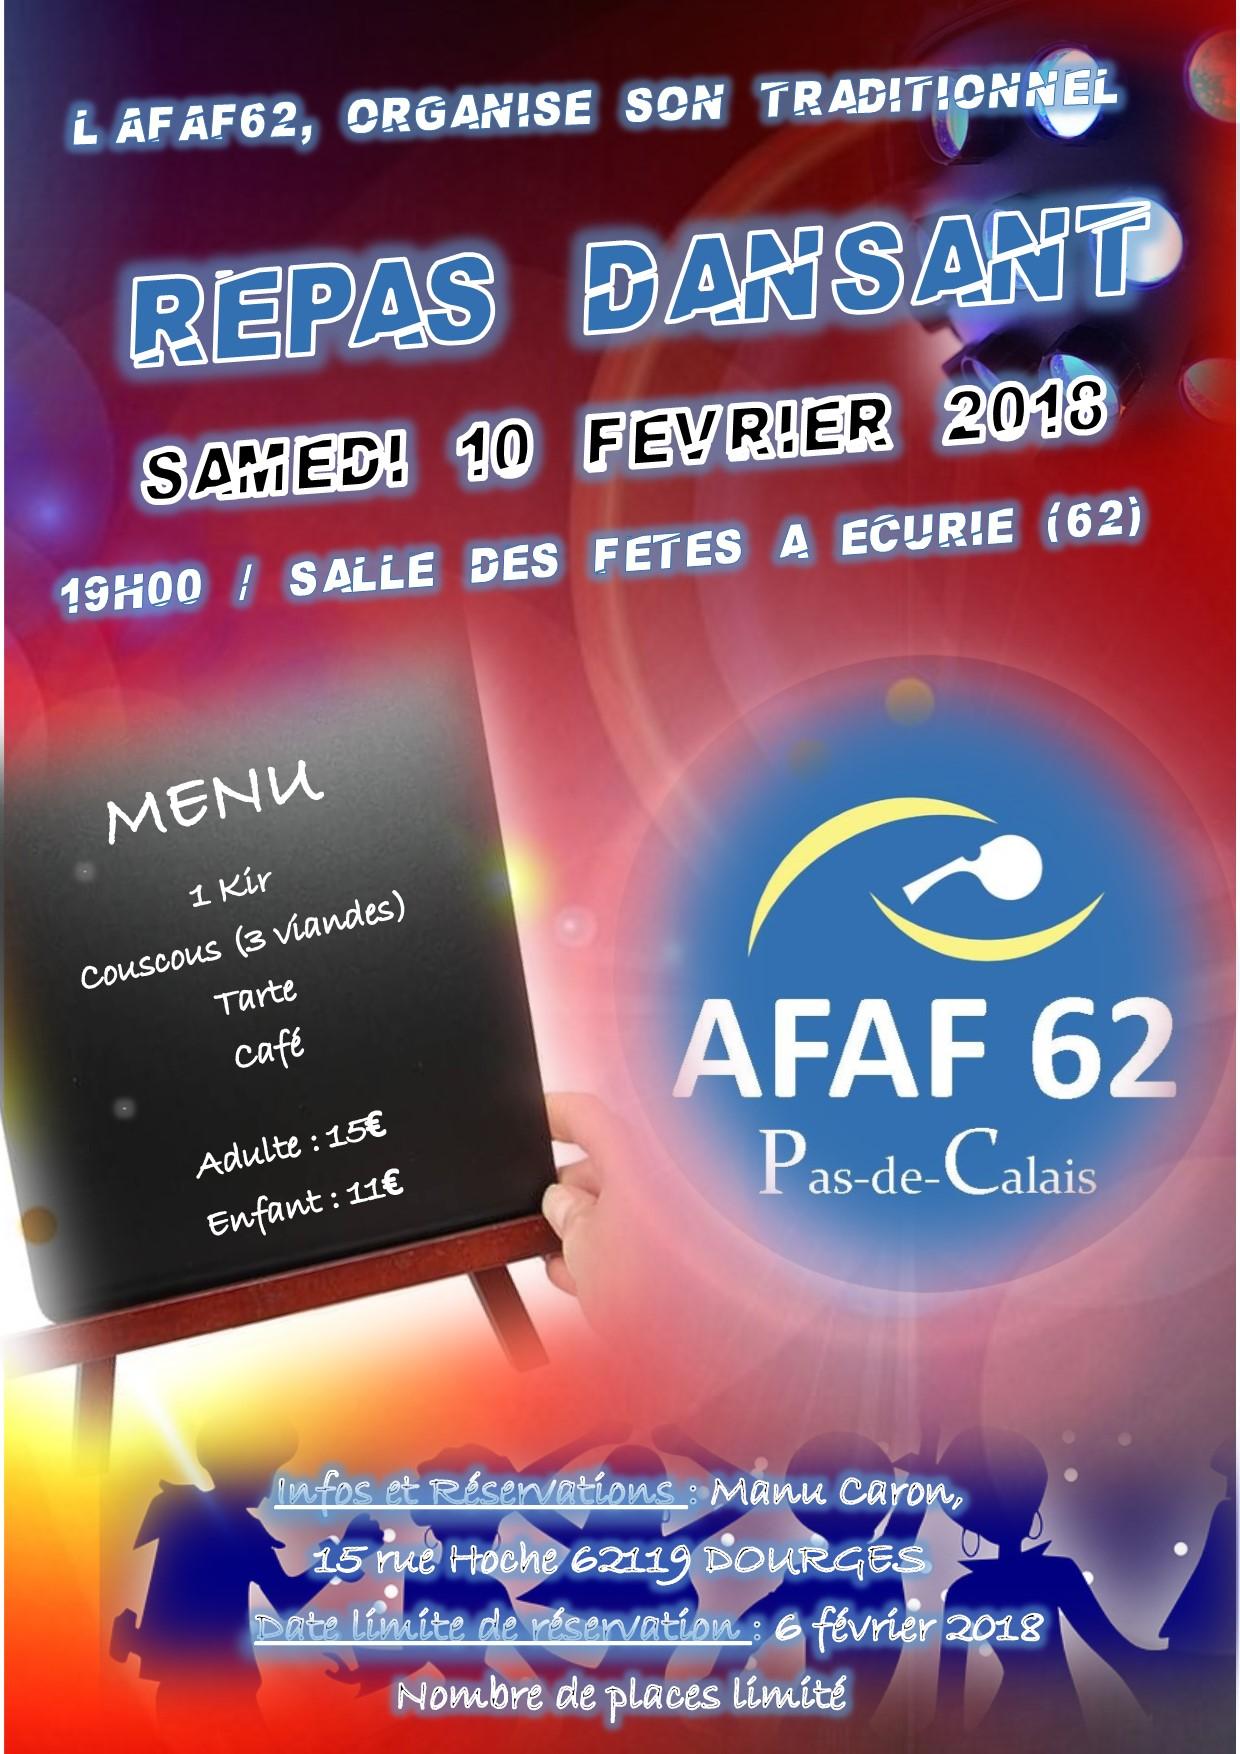 AFAF_62_-_repas_dansant_Février_2018.jpg